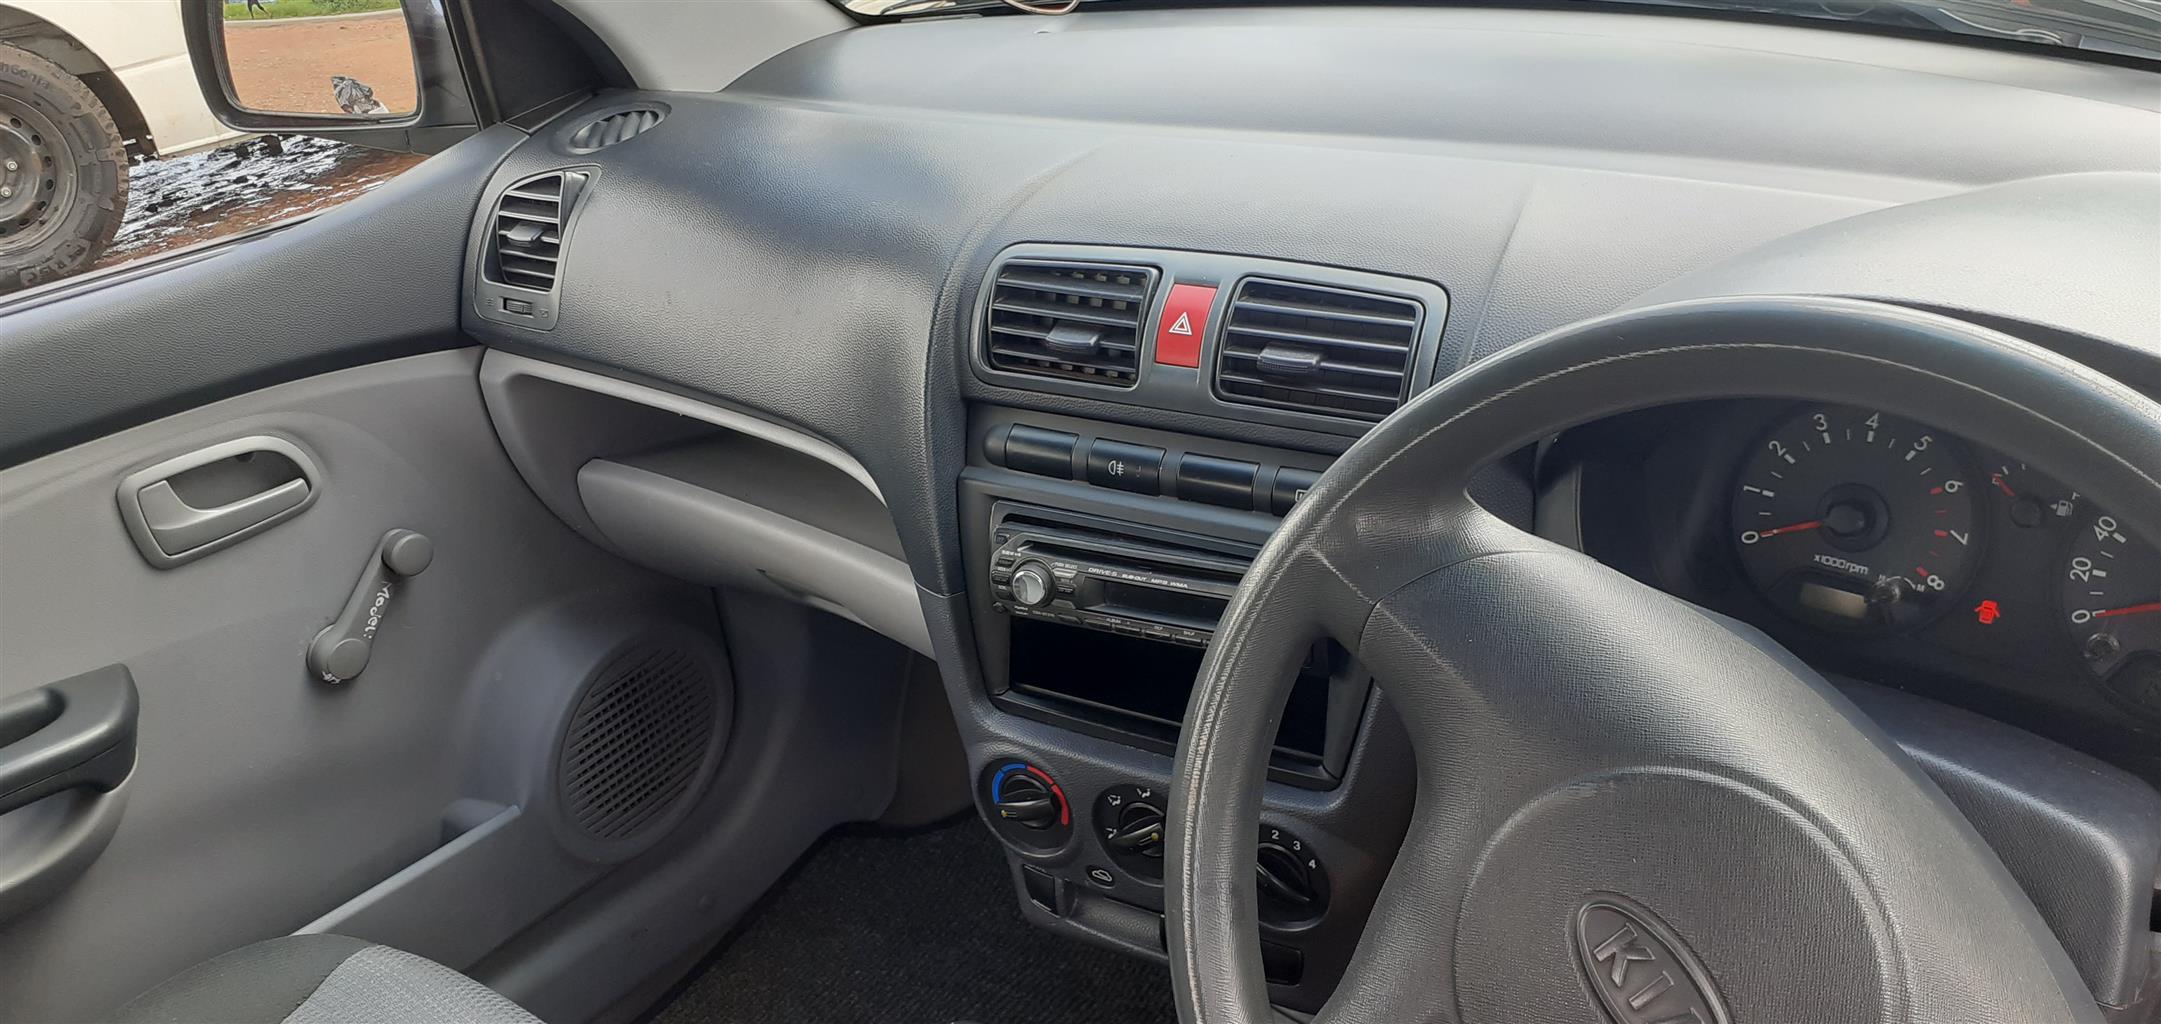 2008 Kia Picanto 1.1